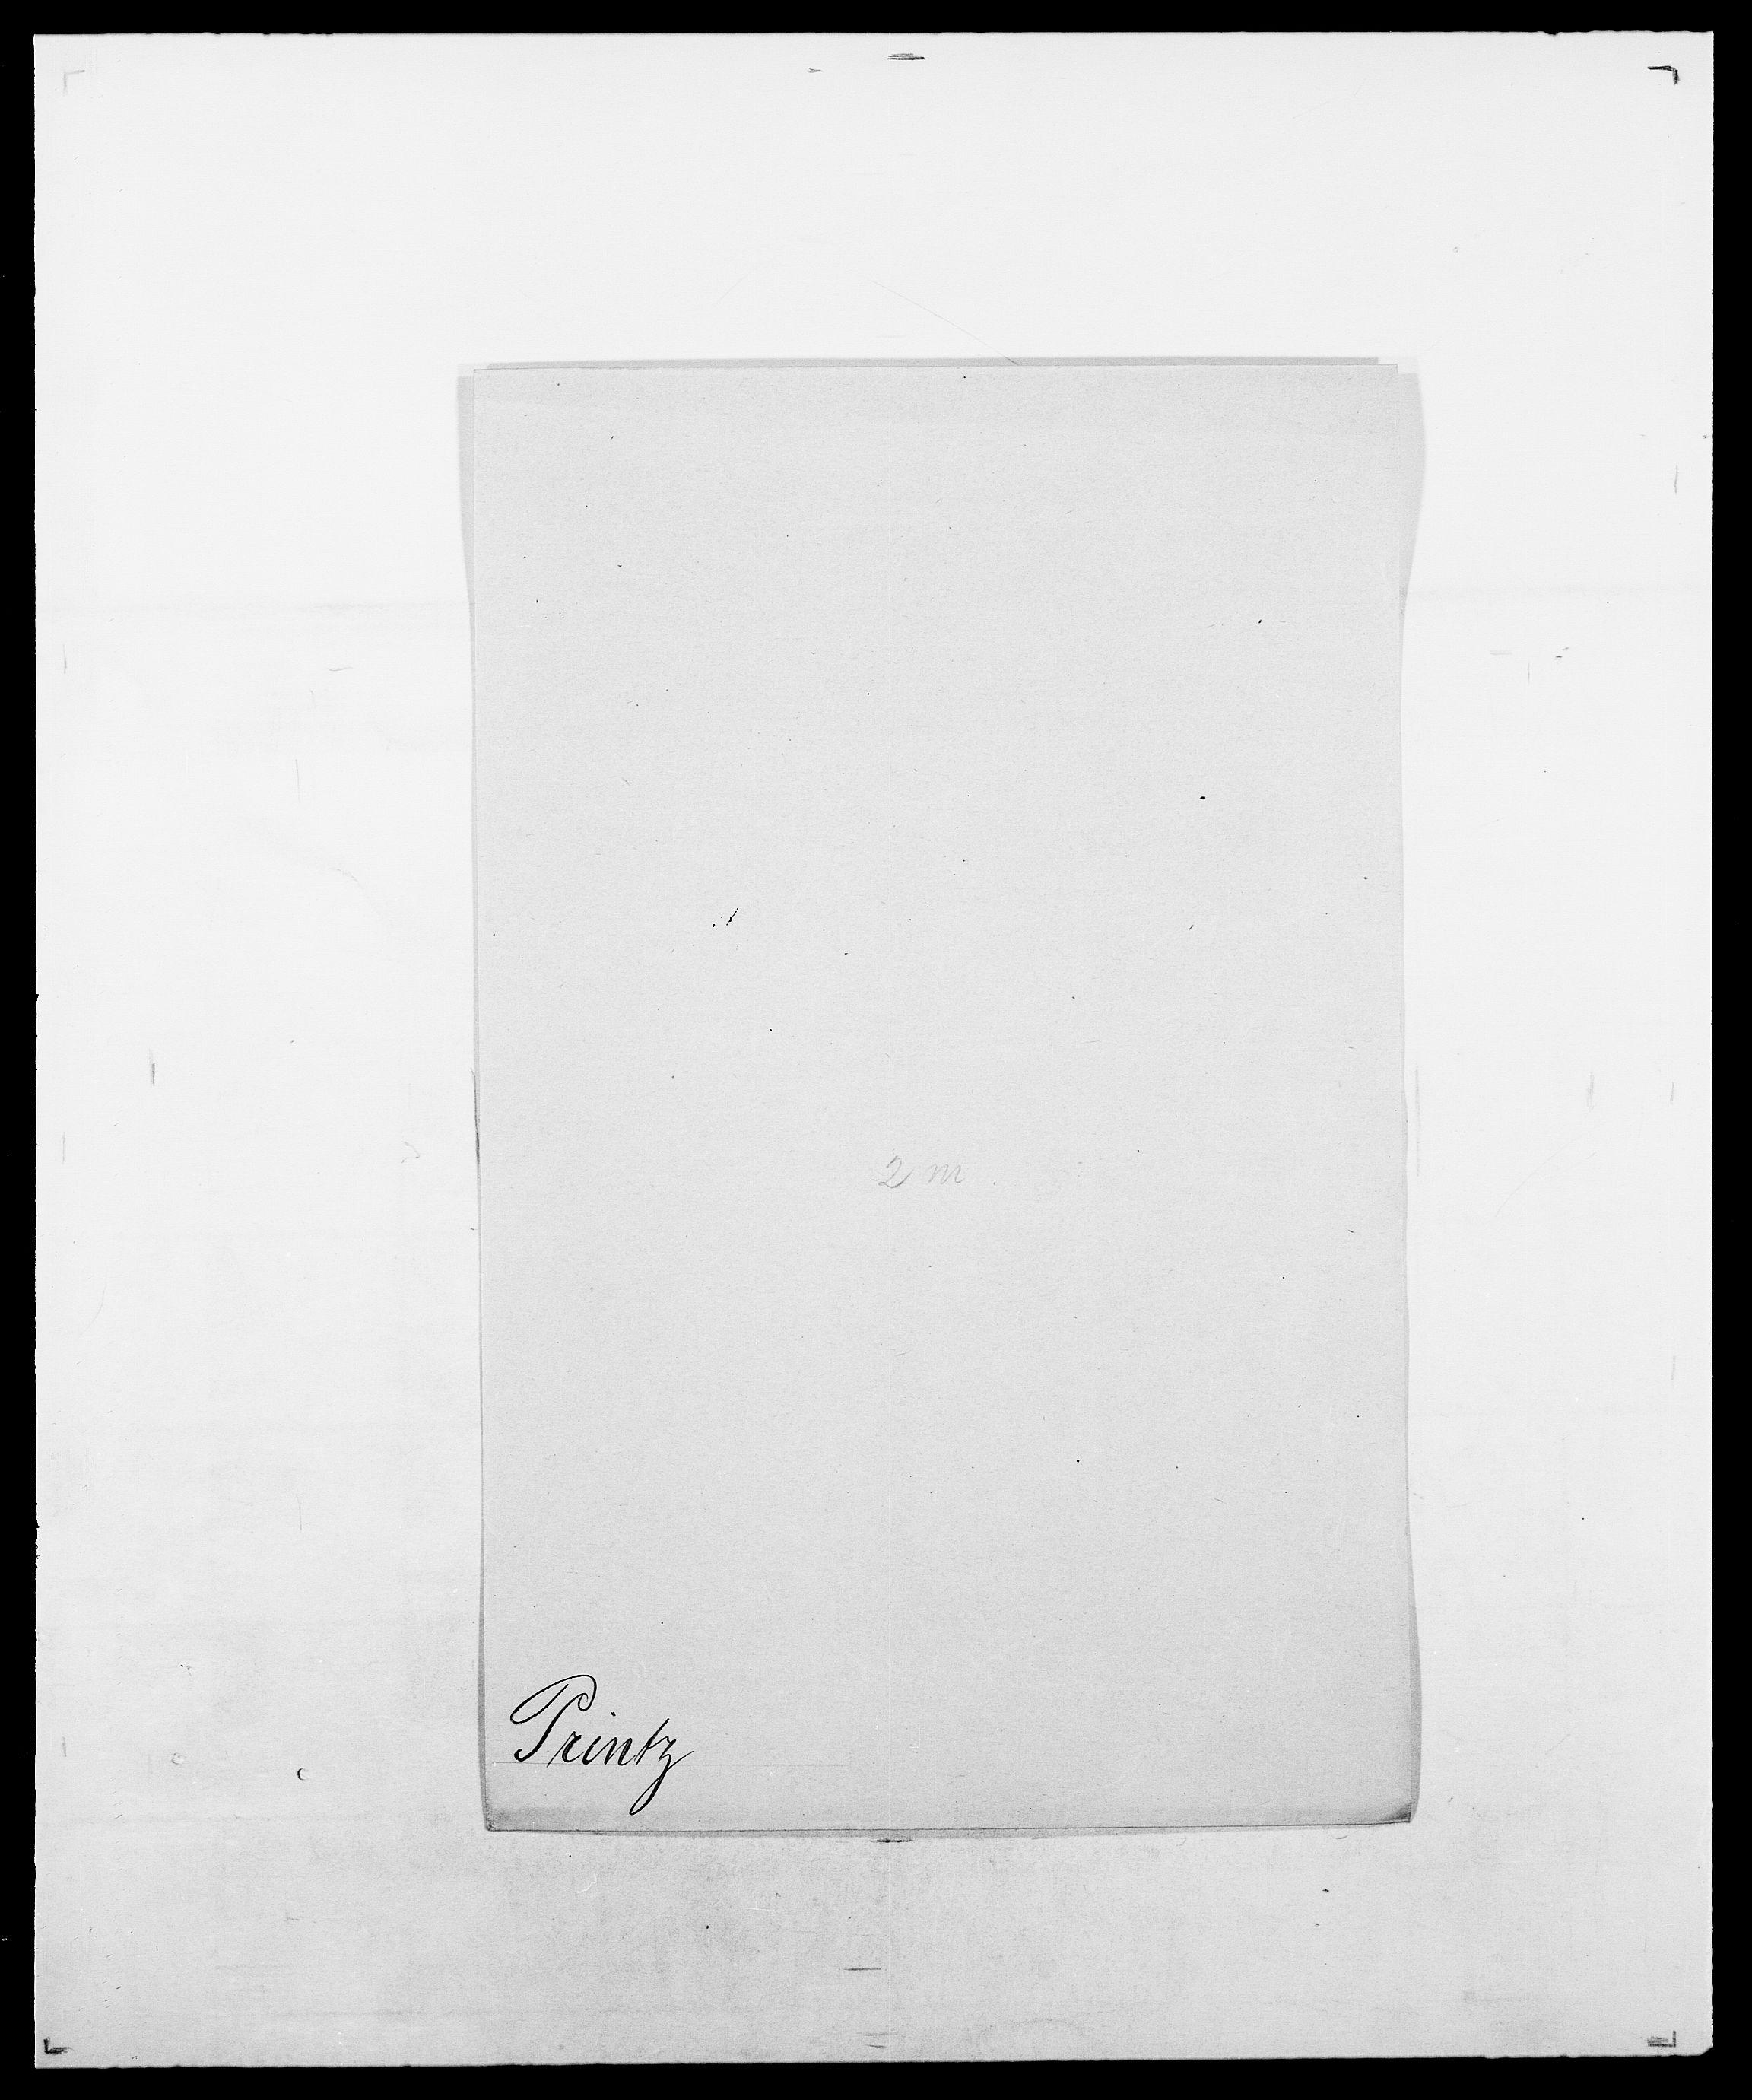 SAO, Delgobe, Charles Antoine - samling, D/Da/L0031: de Place - Raaum, s. 338